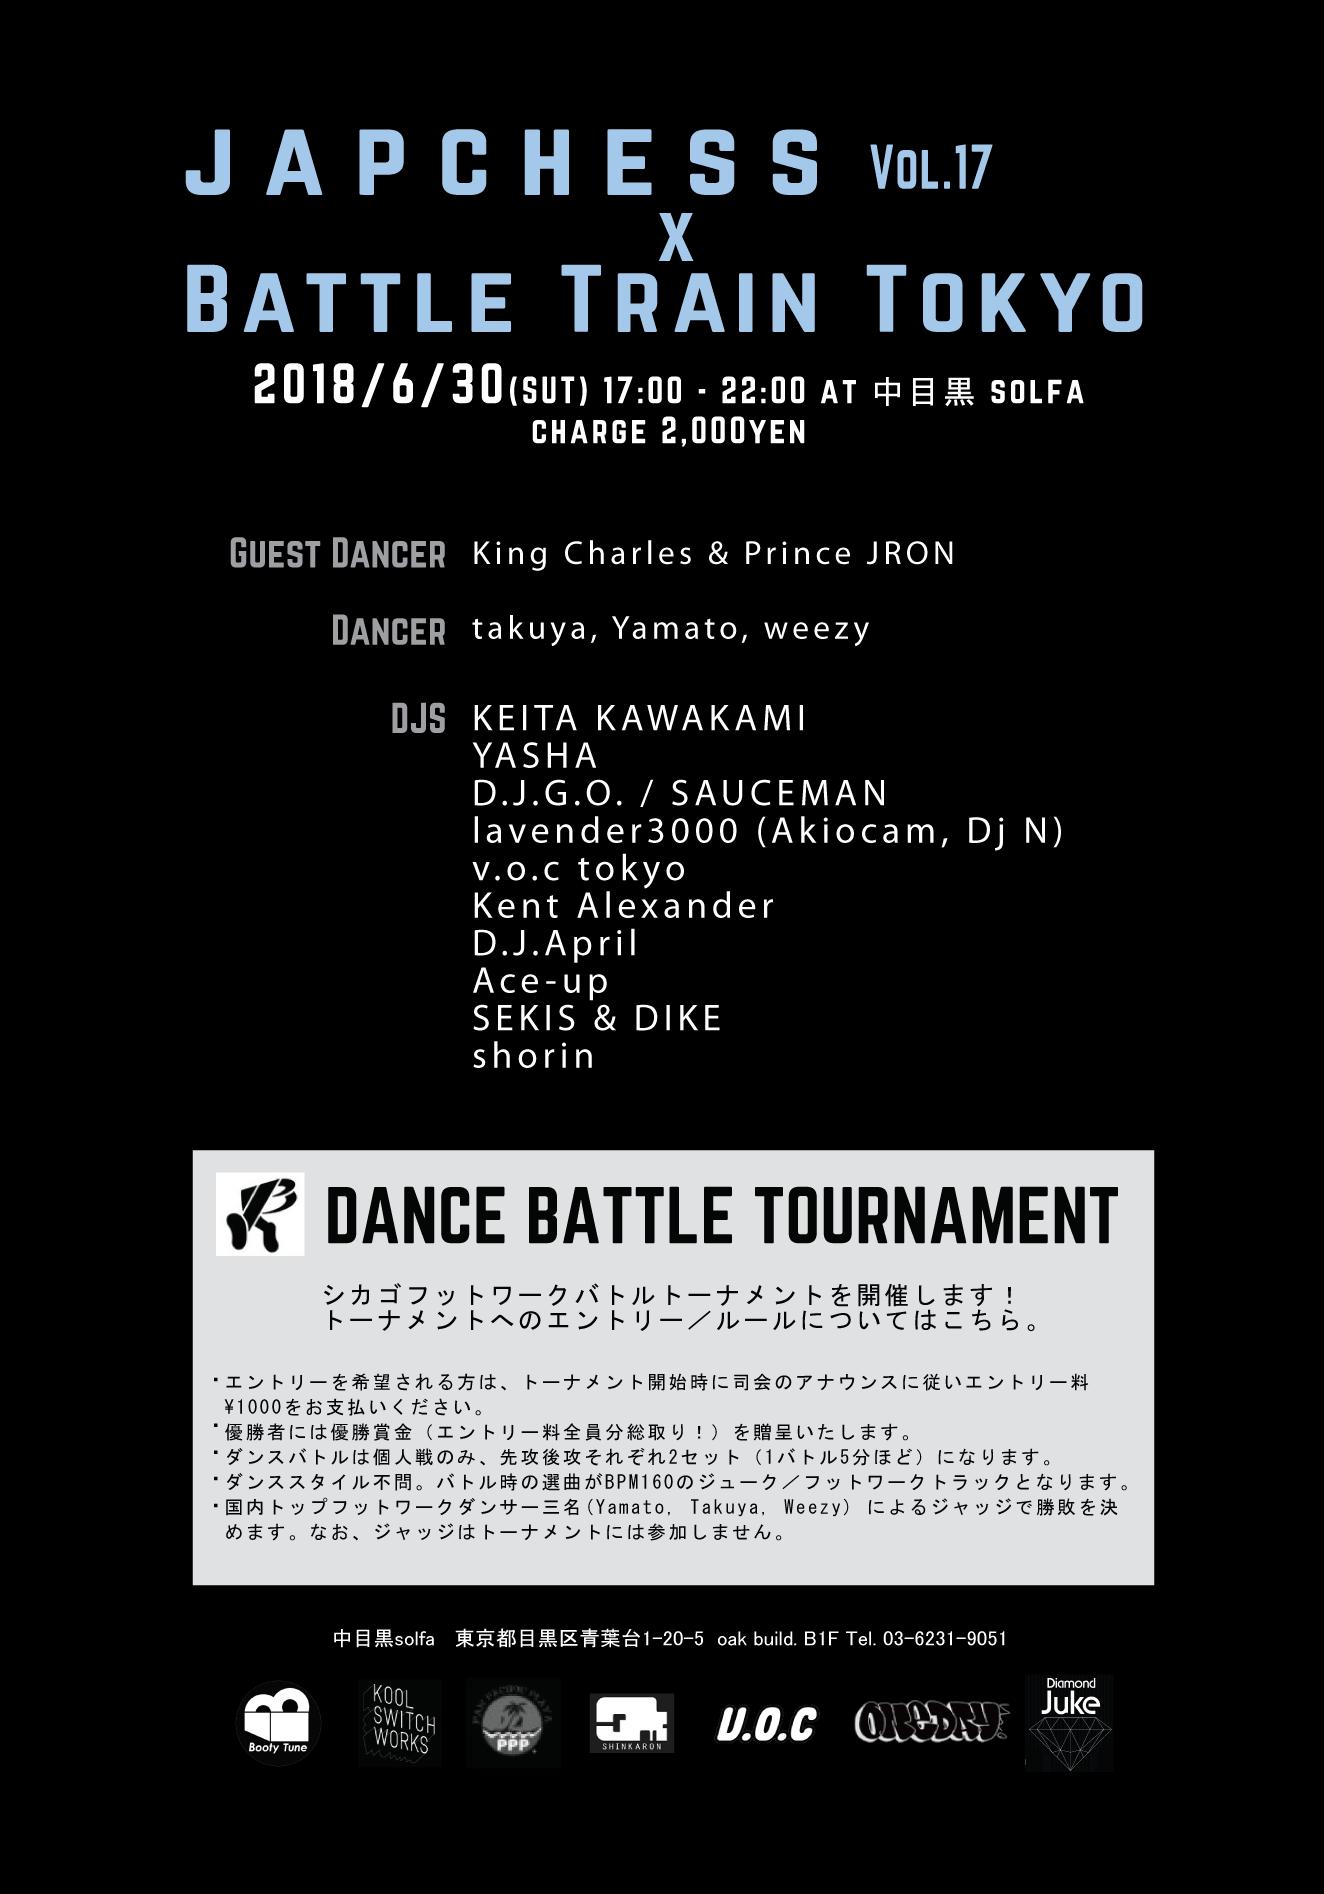 2018/6/30(sat)JAPCHESS vol.17 x Battle Train Tokyo @中目黒 solfa